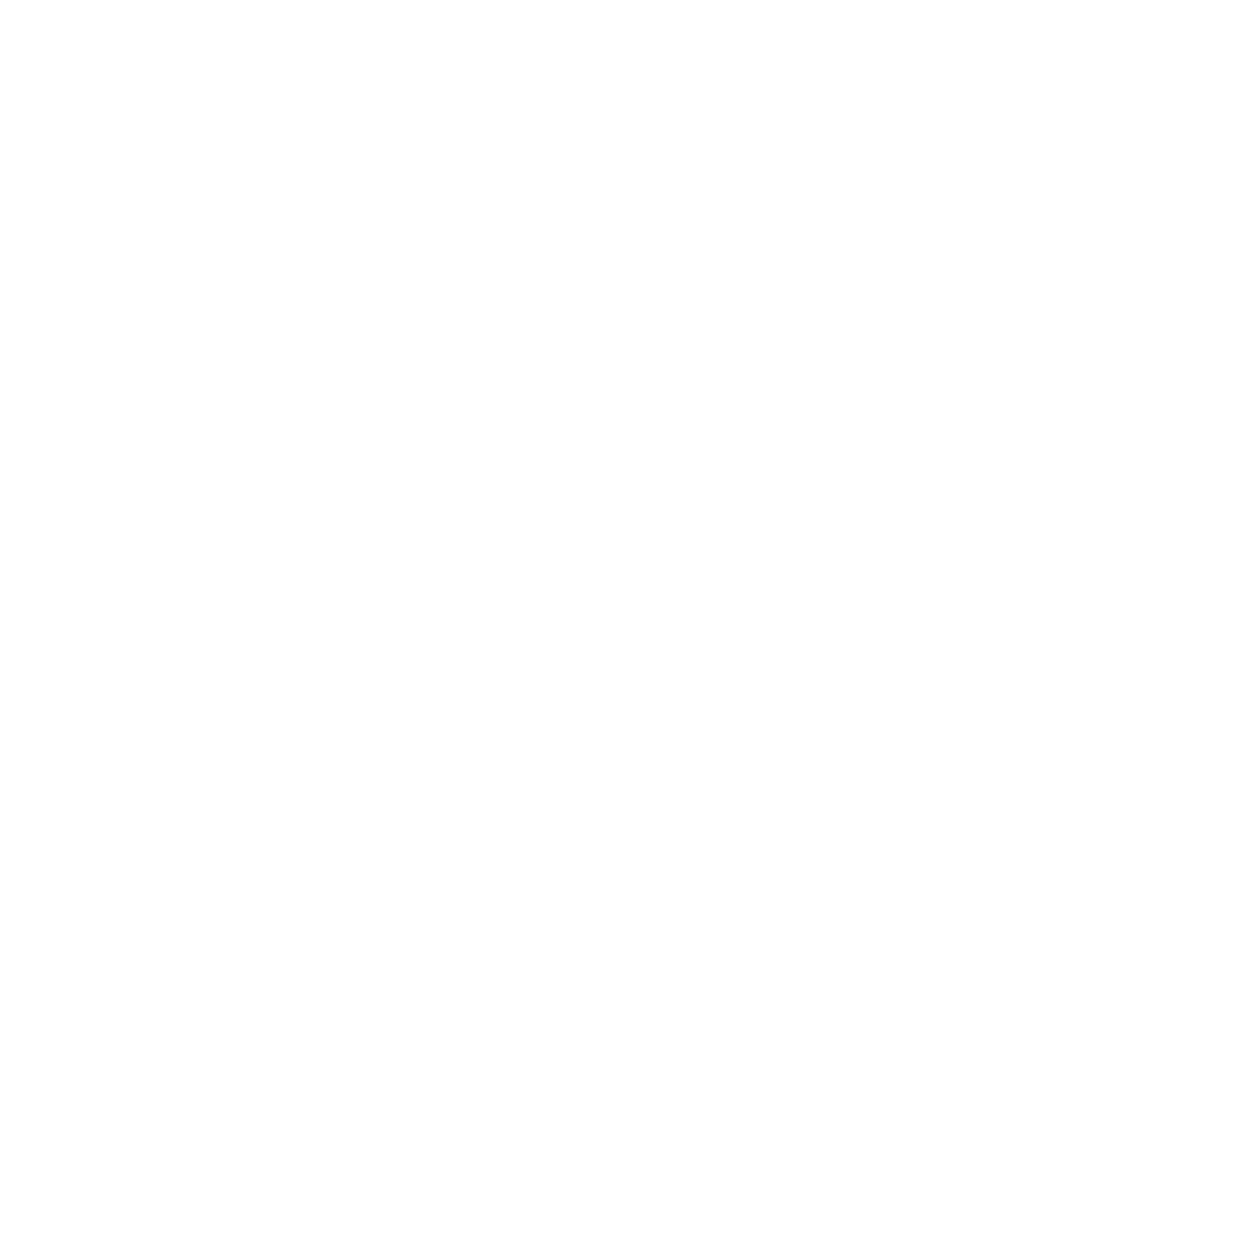 LathamPools_Monogram-White